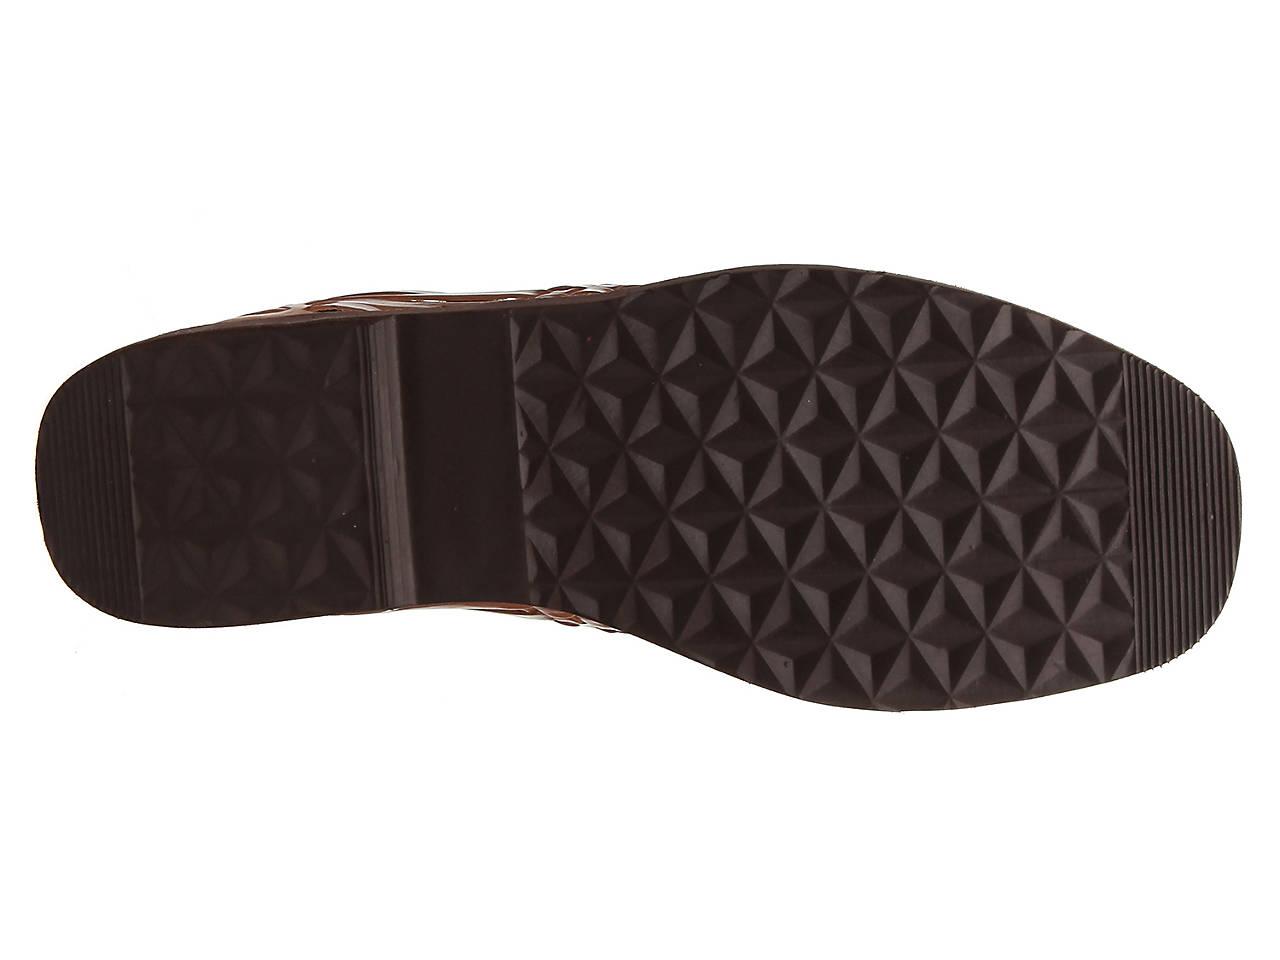 a73c63b603e1c Sunsteps Barclay Huarache Sandal Men s Shoes